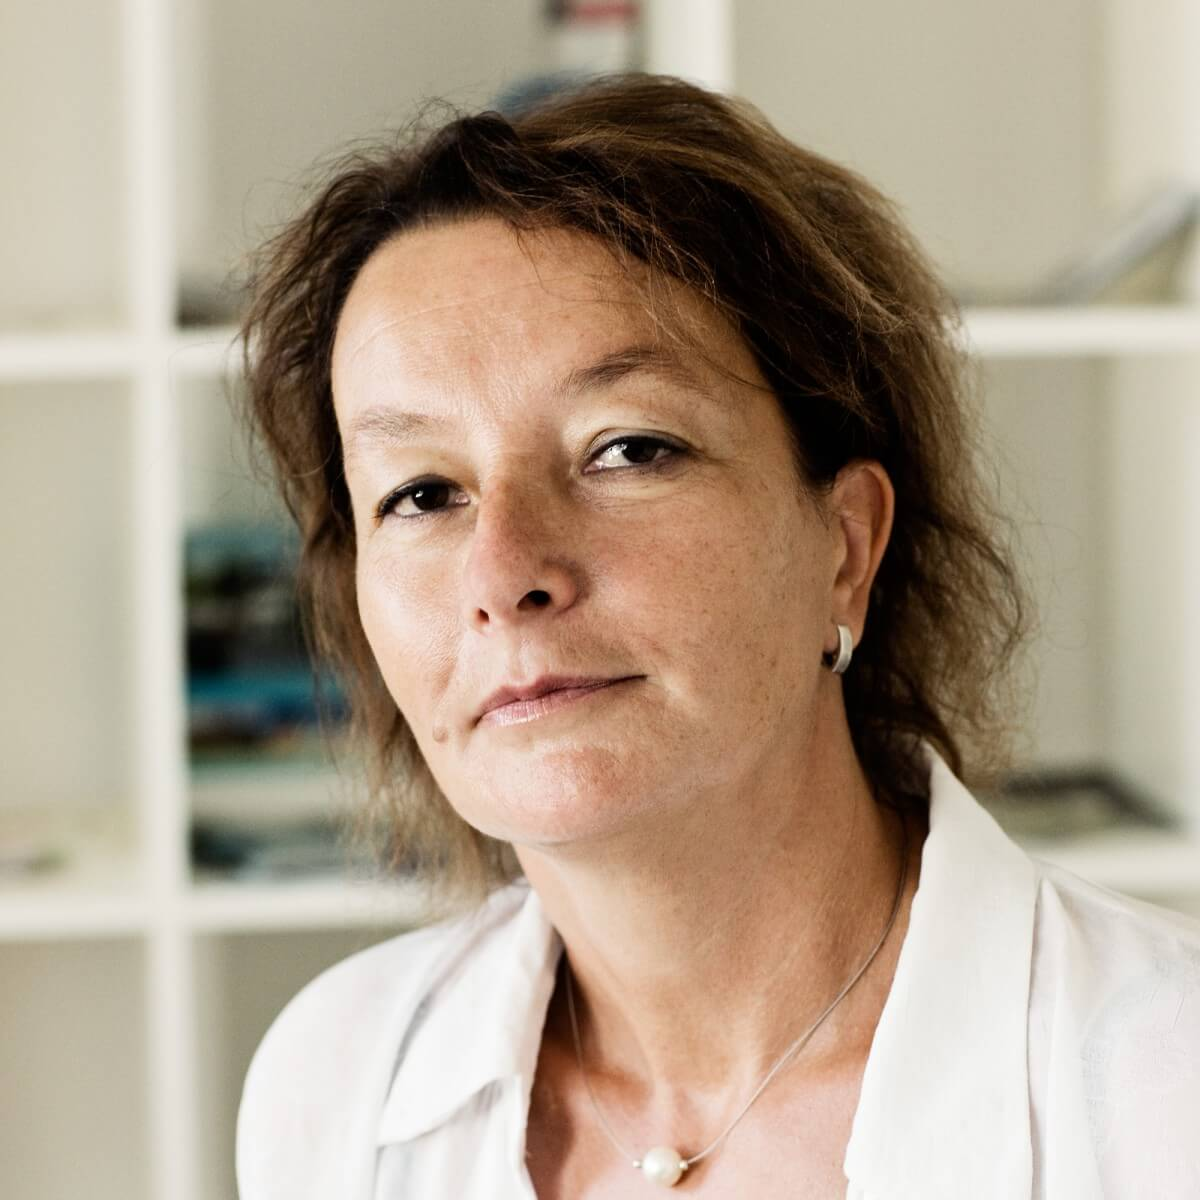 Monika Kohnle